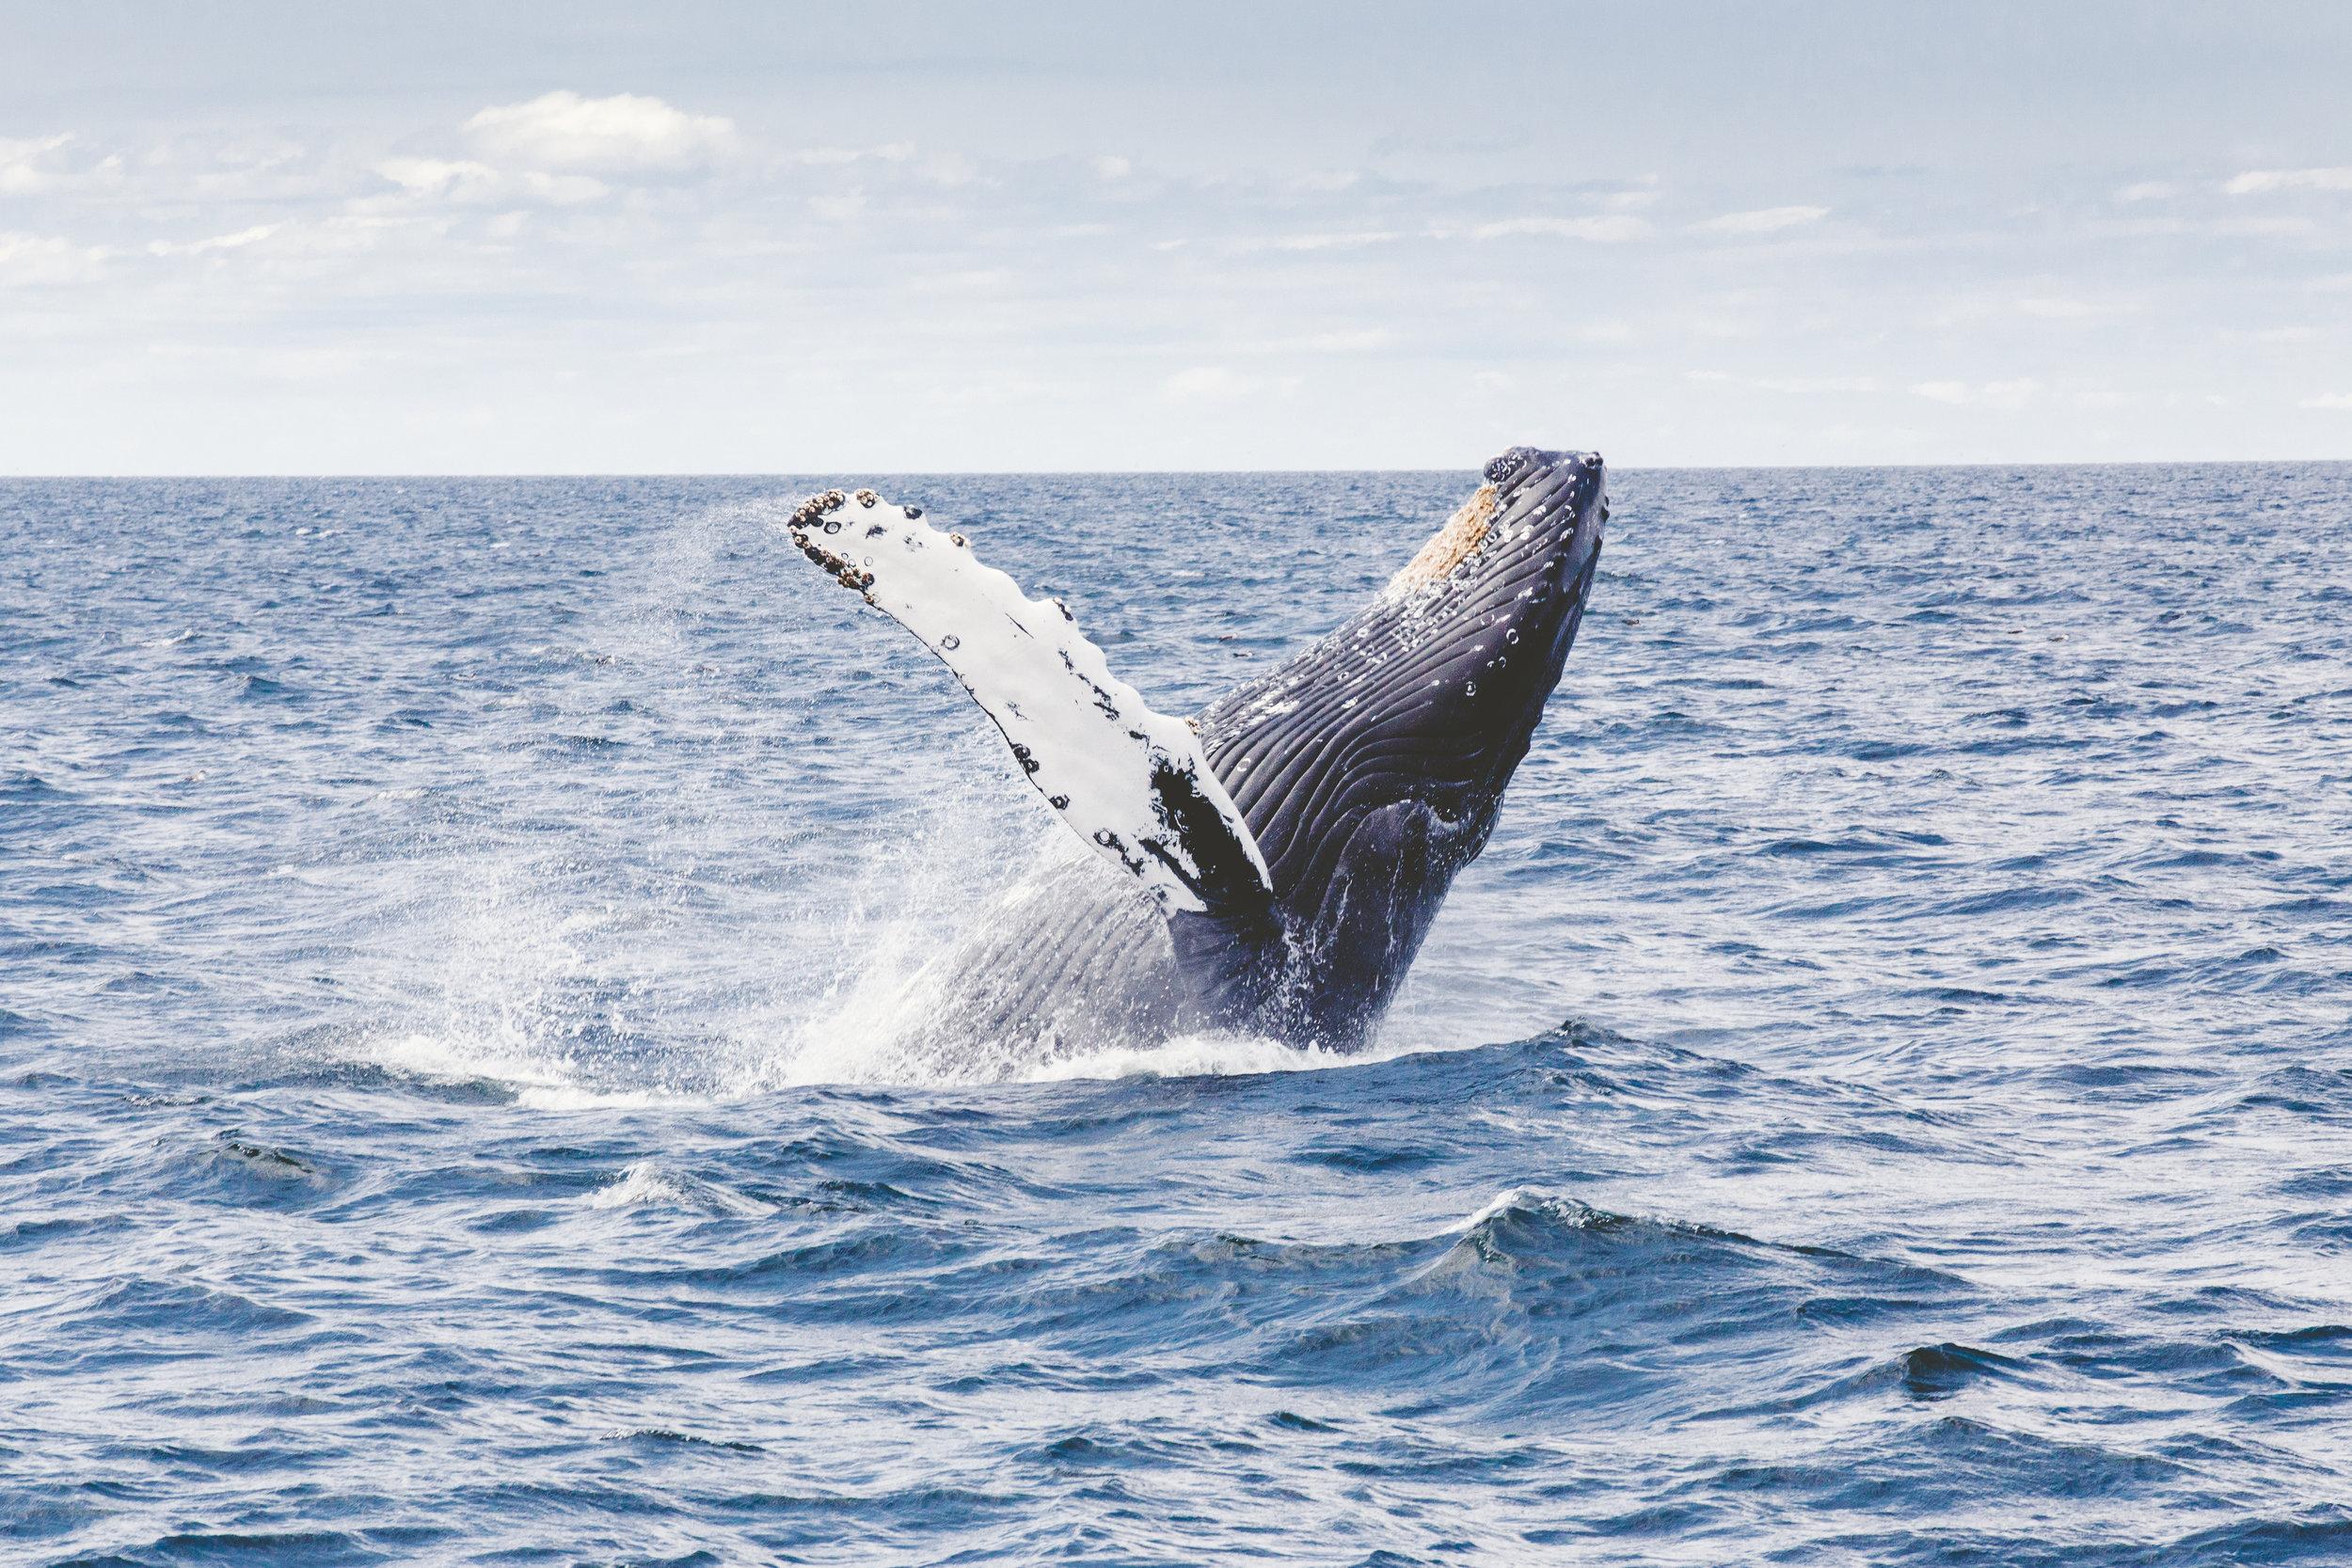 Whale breaching thomas kelley Up cW.jpeg